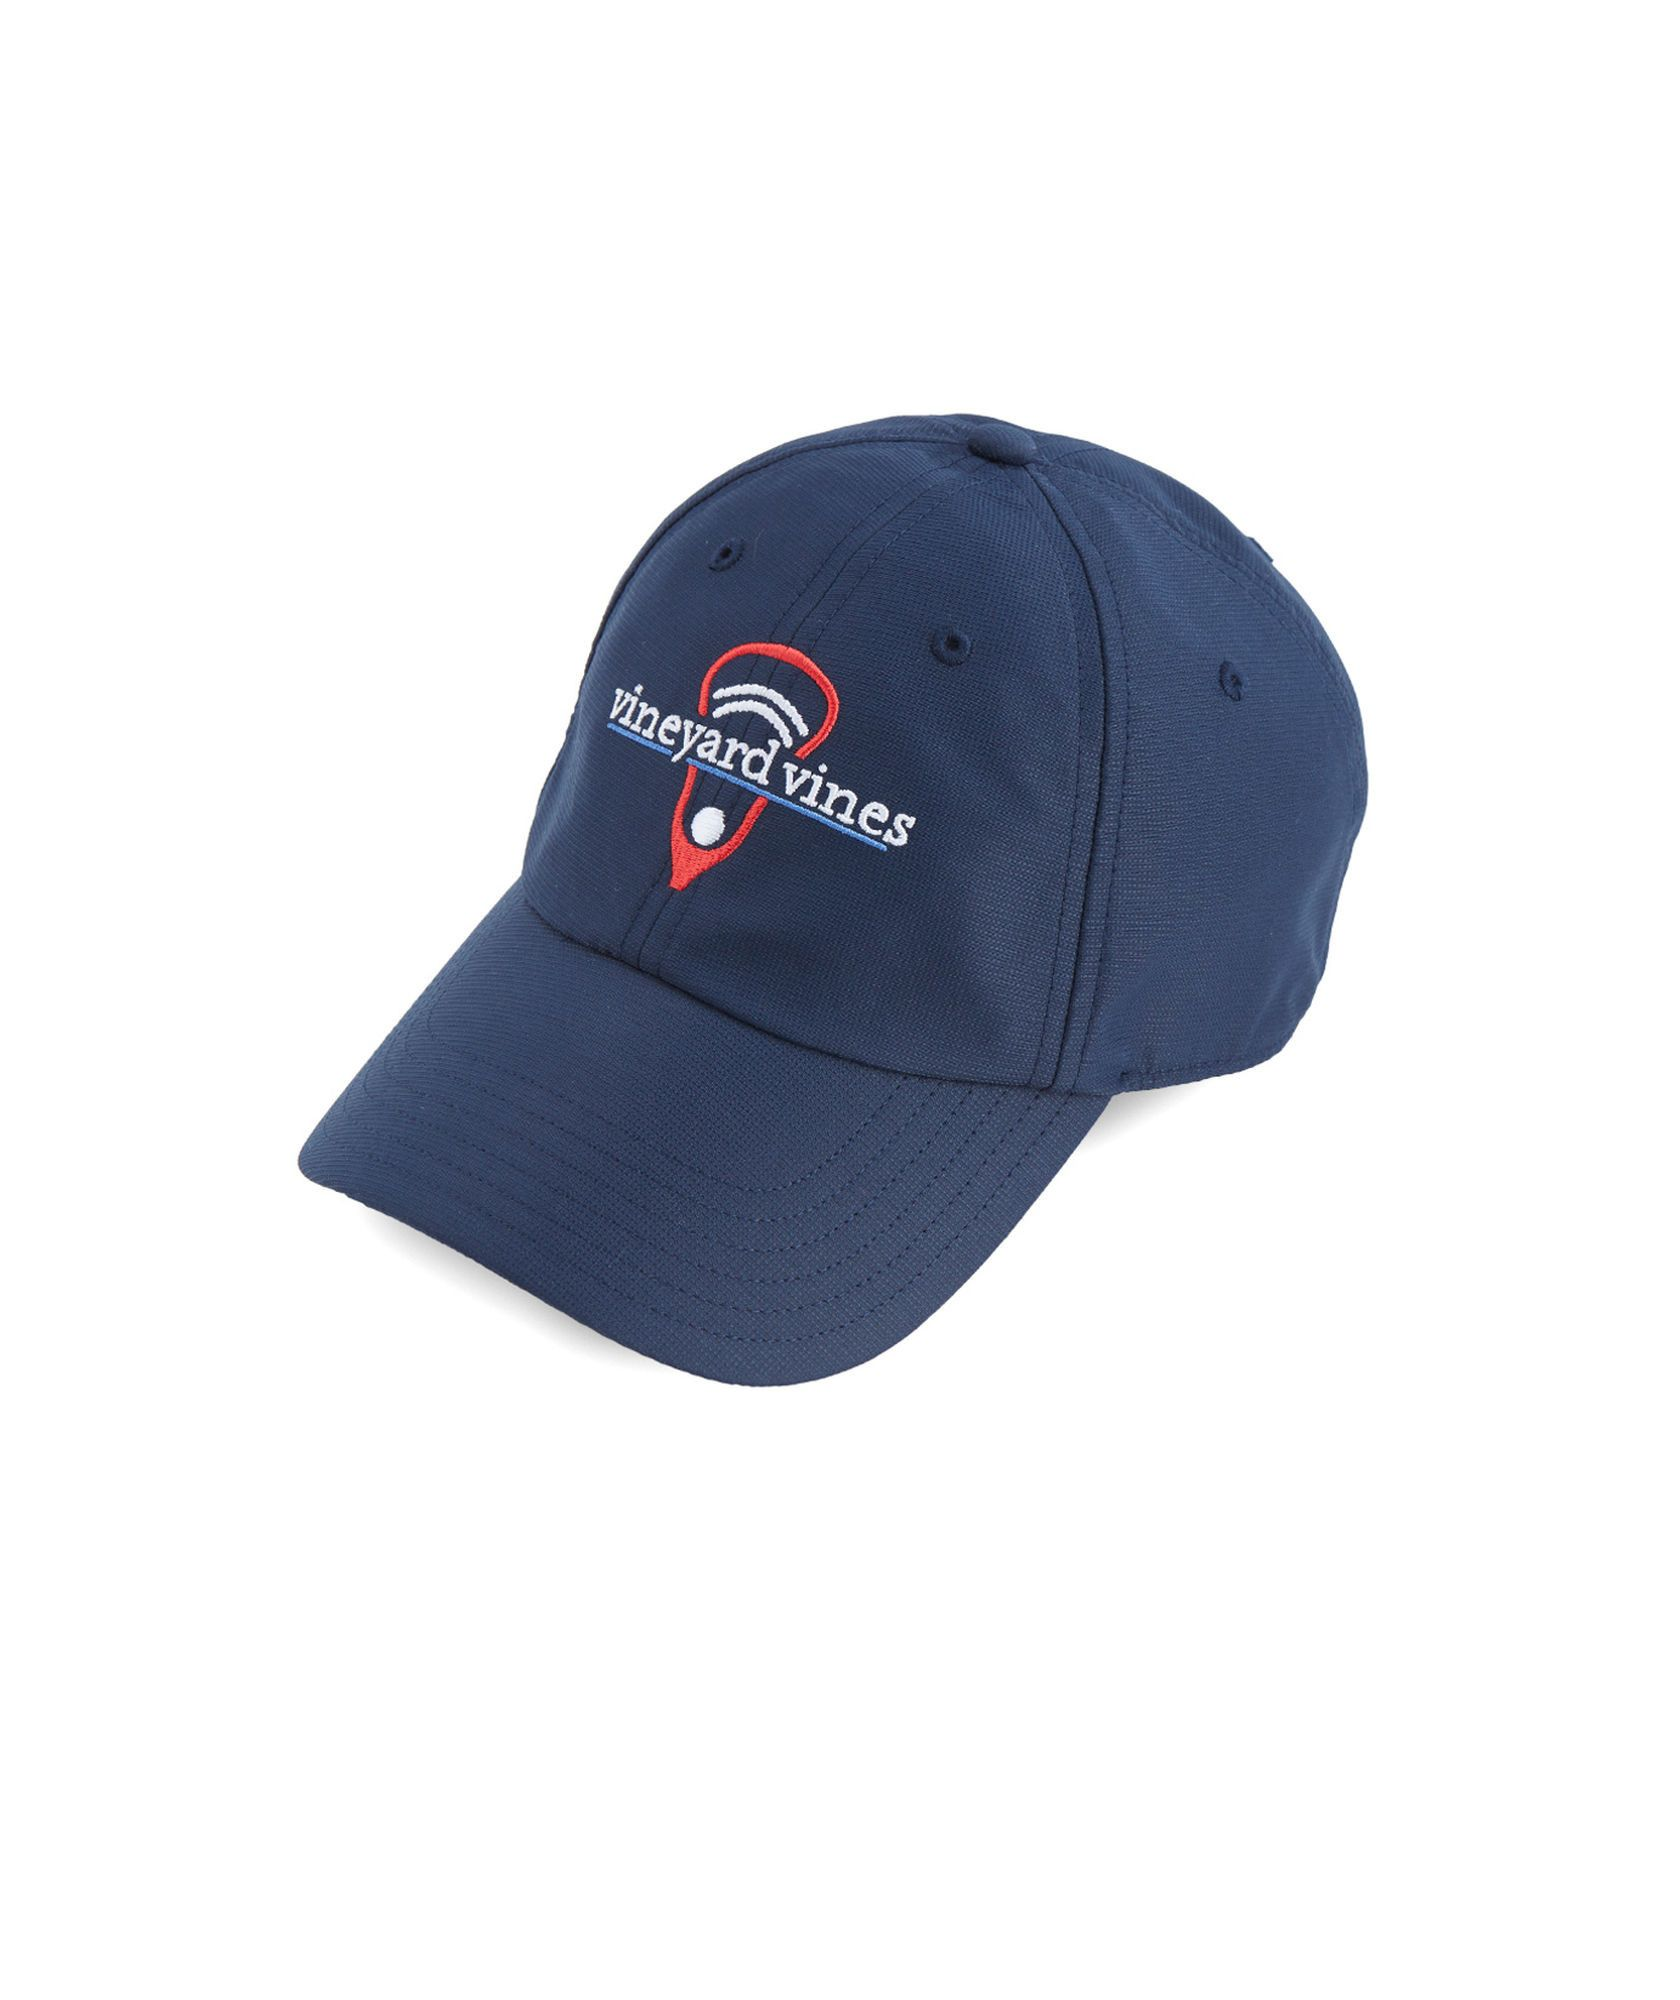 Vineyard Vines Lax Performance Hat - Vineyard Navy  6ec6386748c0